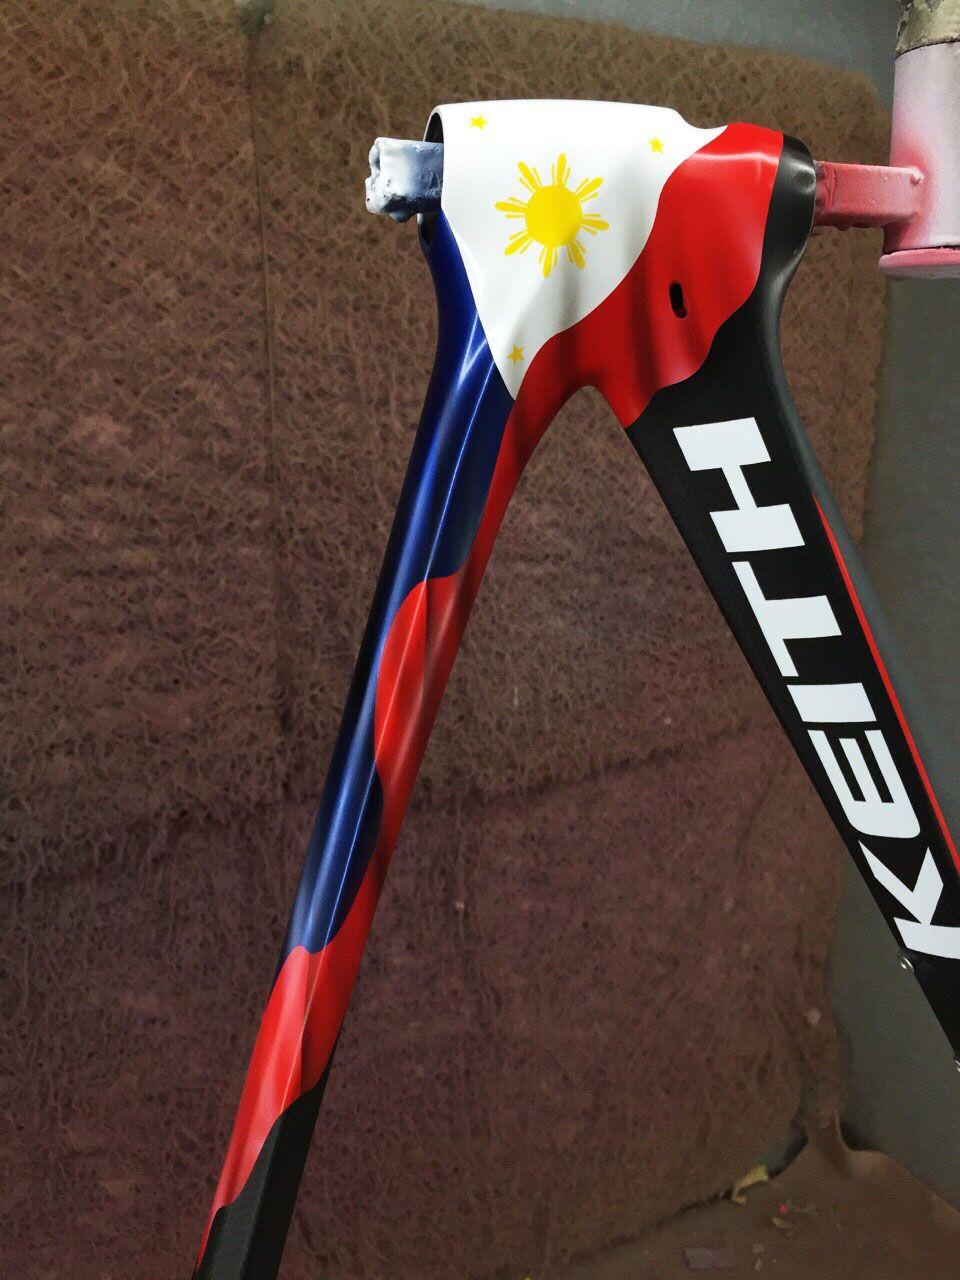 Amazing Painted Job To Make The Flag Come Alive Philippine Flag Custom Paint Bike Shirts [ 1280 x 960 Pixel ]